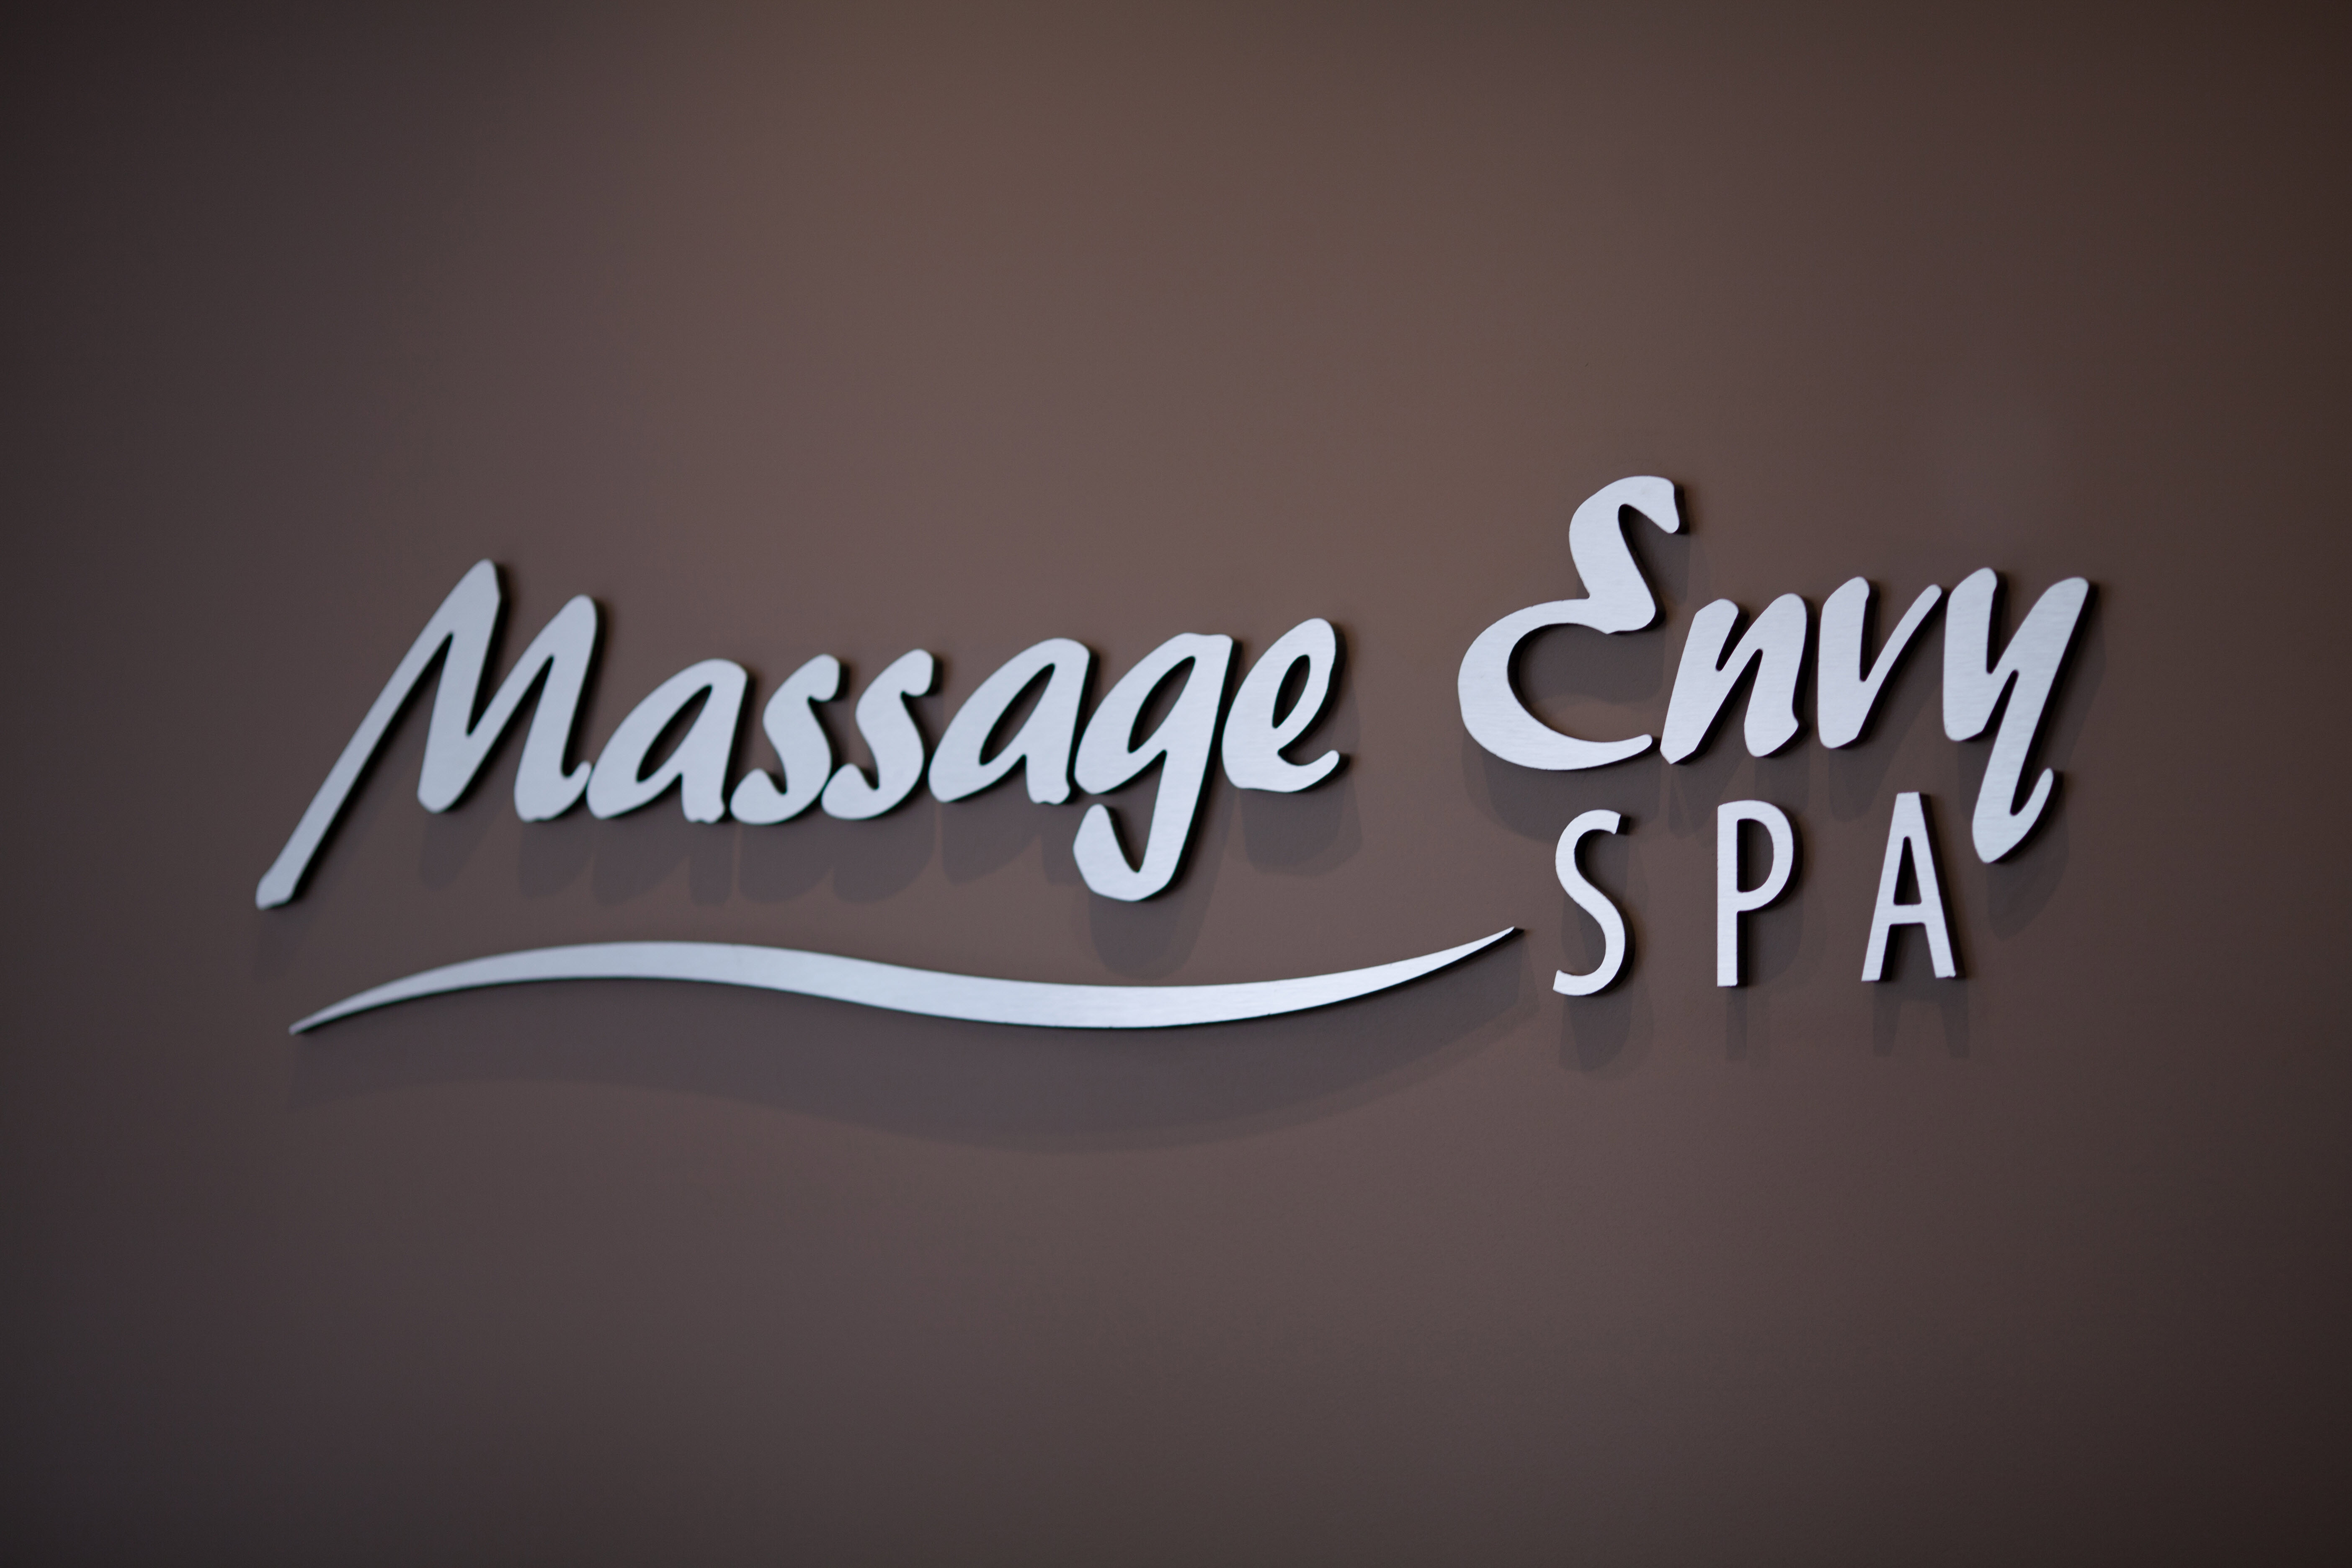 Massage Envy Spa - Crabtree Valley